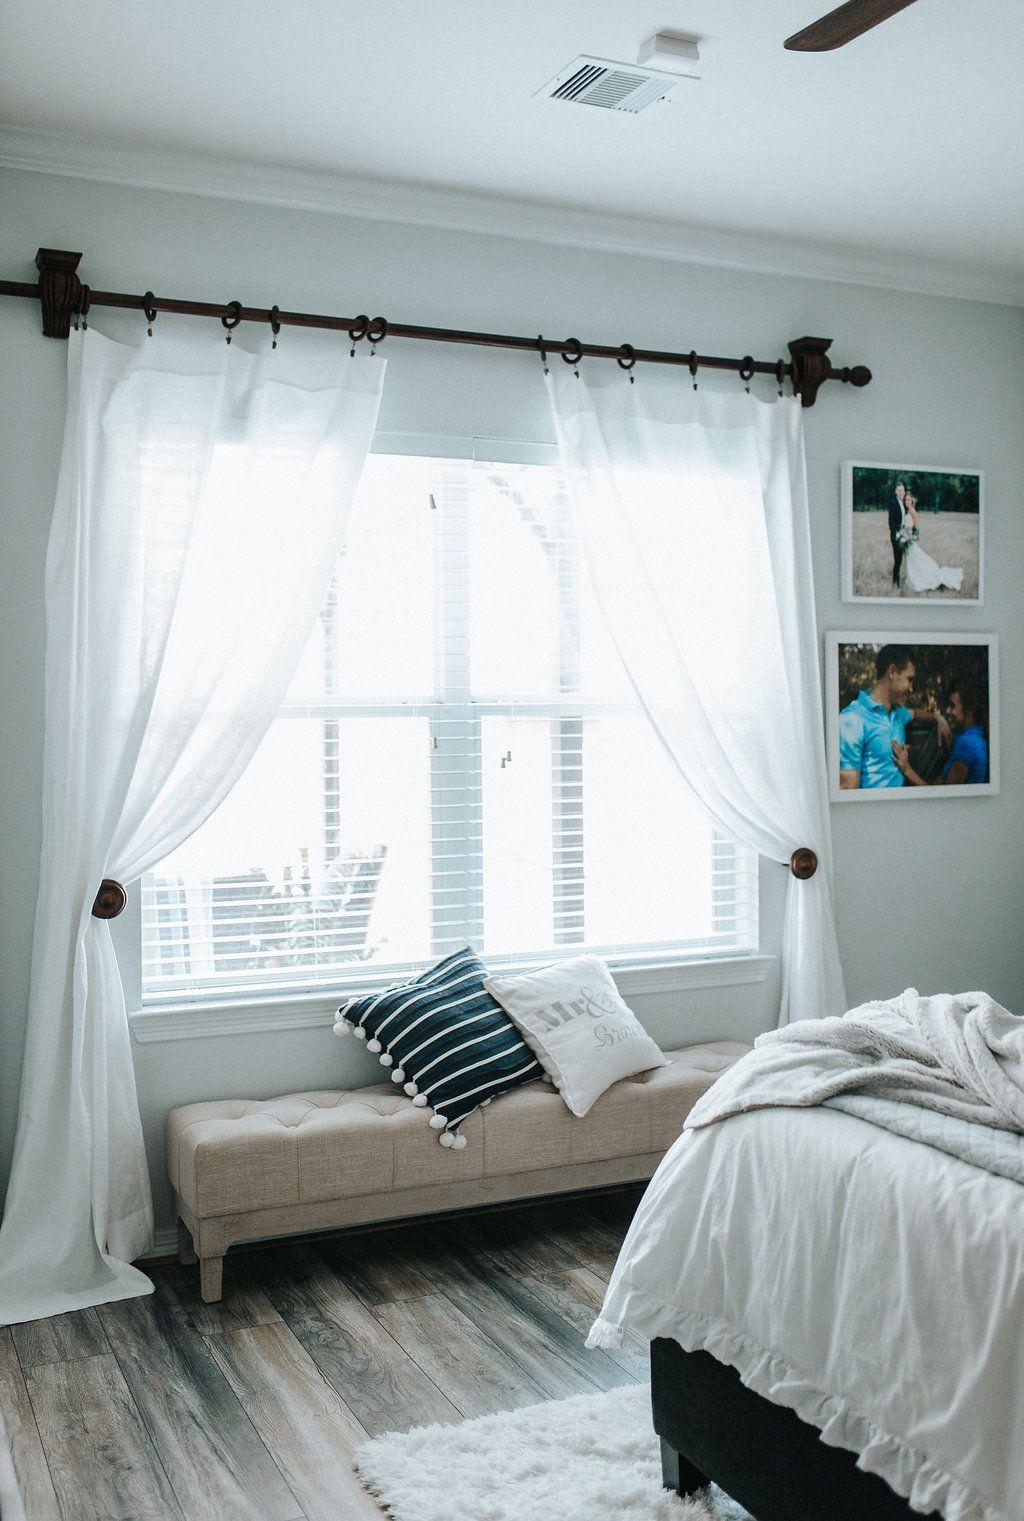 design bedroom%0A Bedroom bench   Nightstand Ideas   Master bedroom Decor   Bedroom decor  inspo   Uptown with